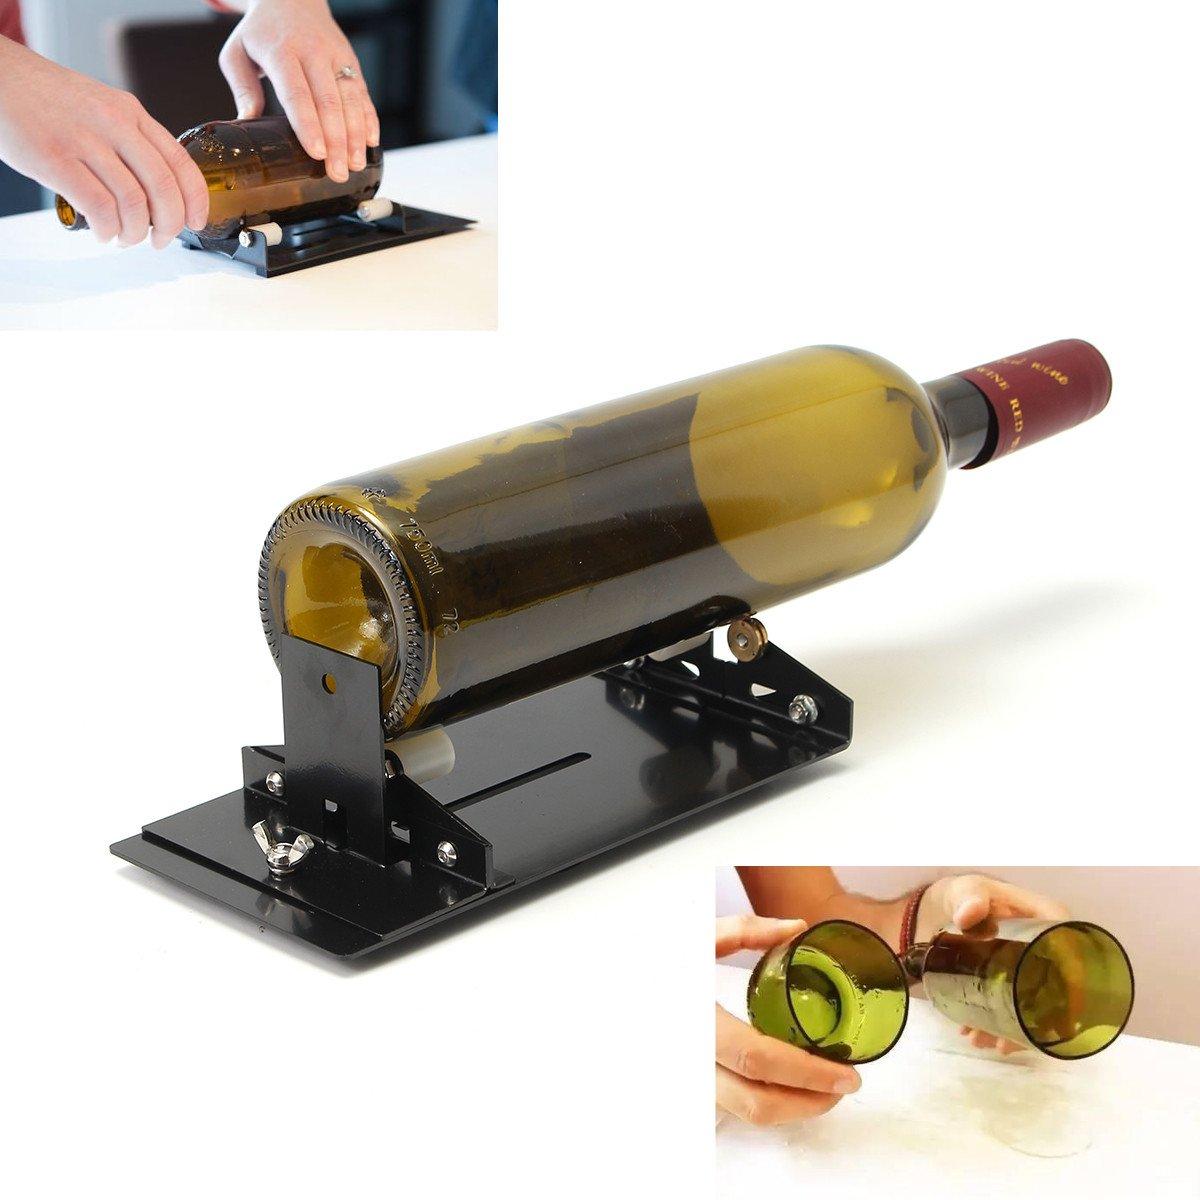 OlogyMart Glass Bottle Cutter Machine Cutting Tool Kit Diy Craft Cut Wine Jar Beer Recycle